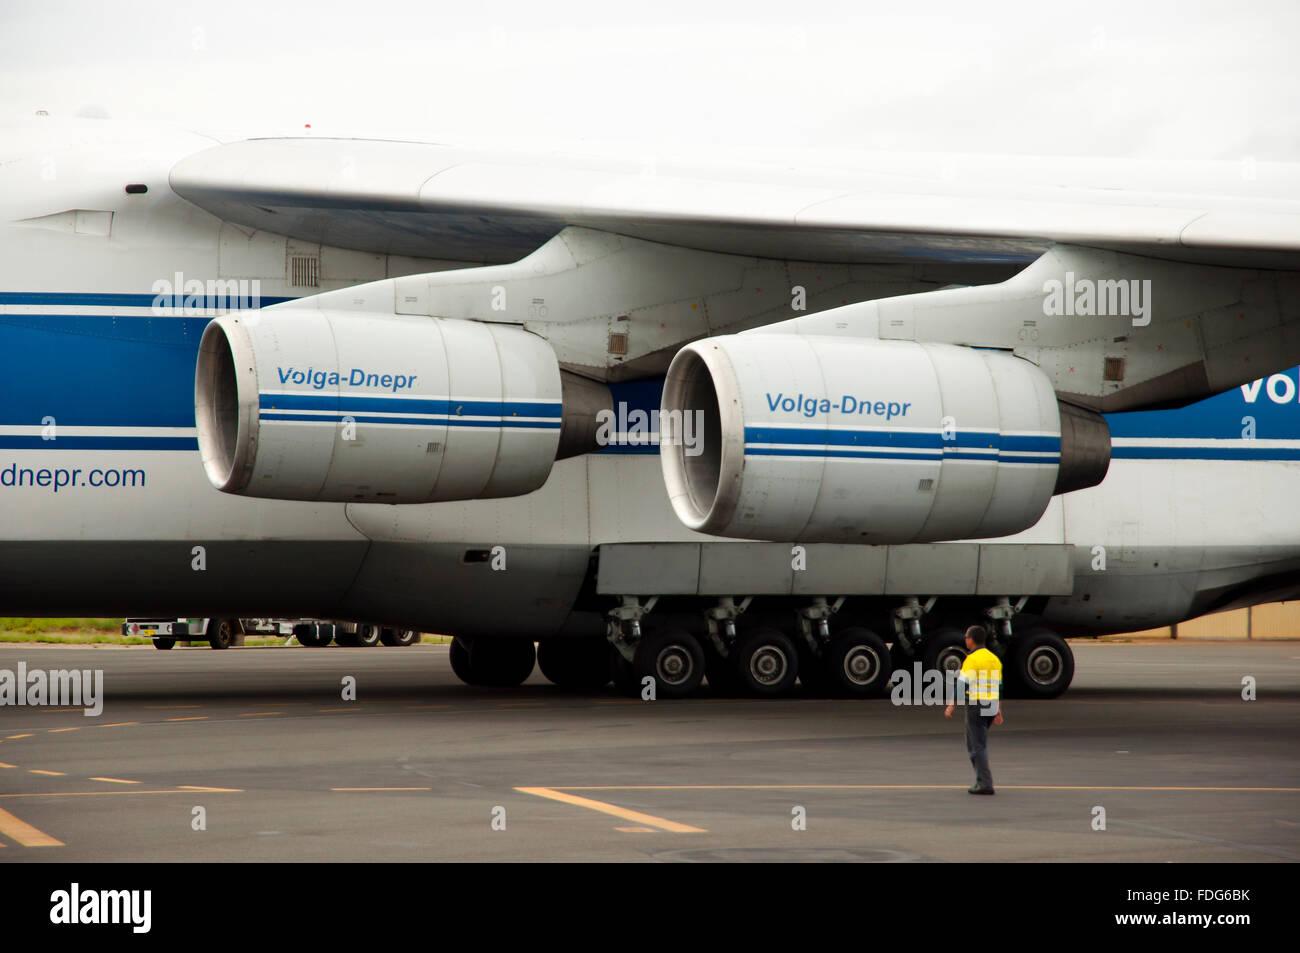 Russian Volga-Dnepr Antonov (AN-124) cargo airplane - Stock Image